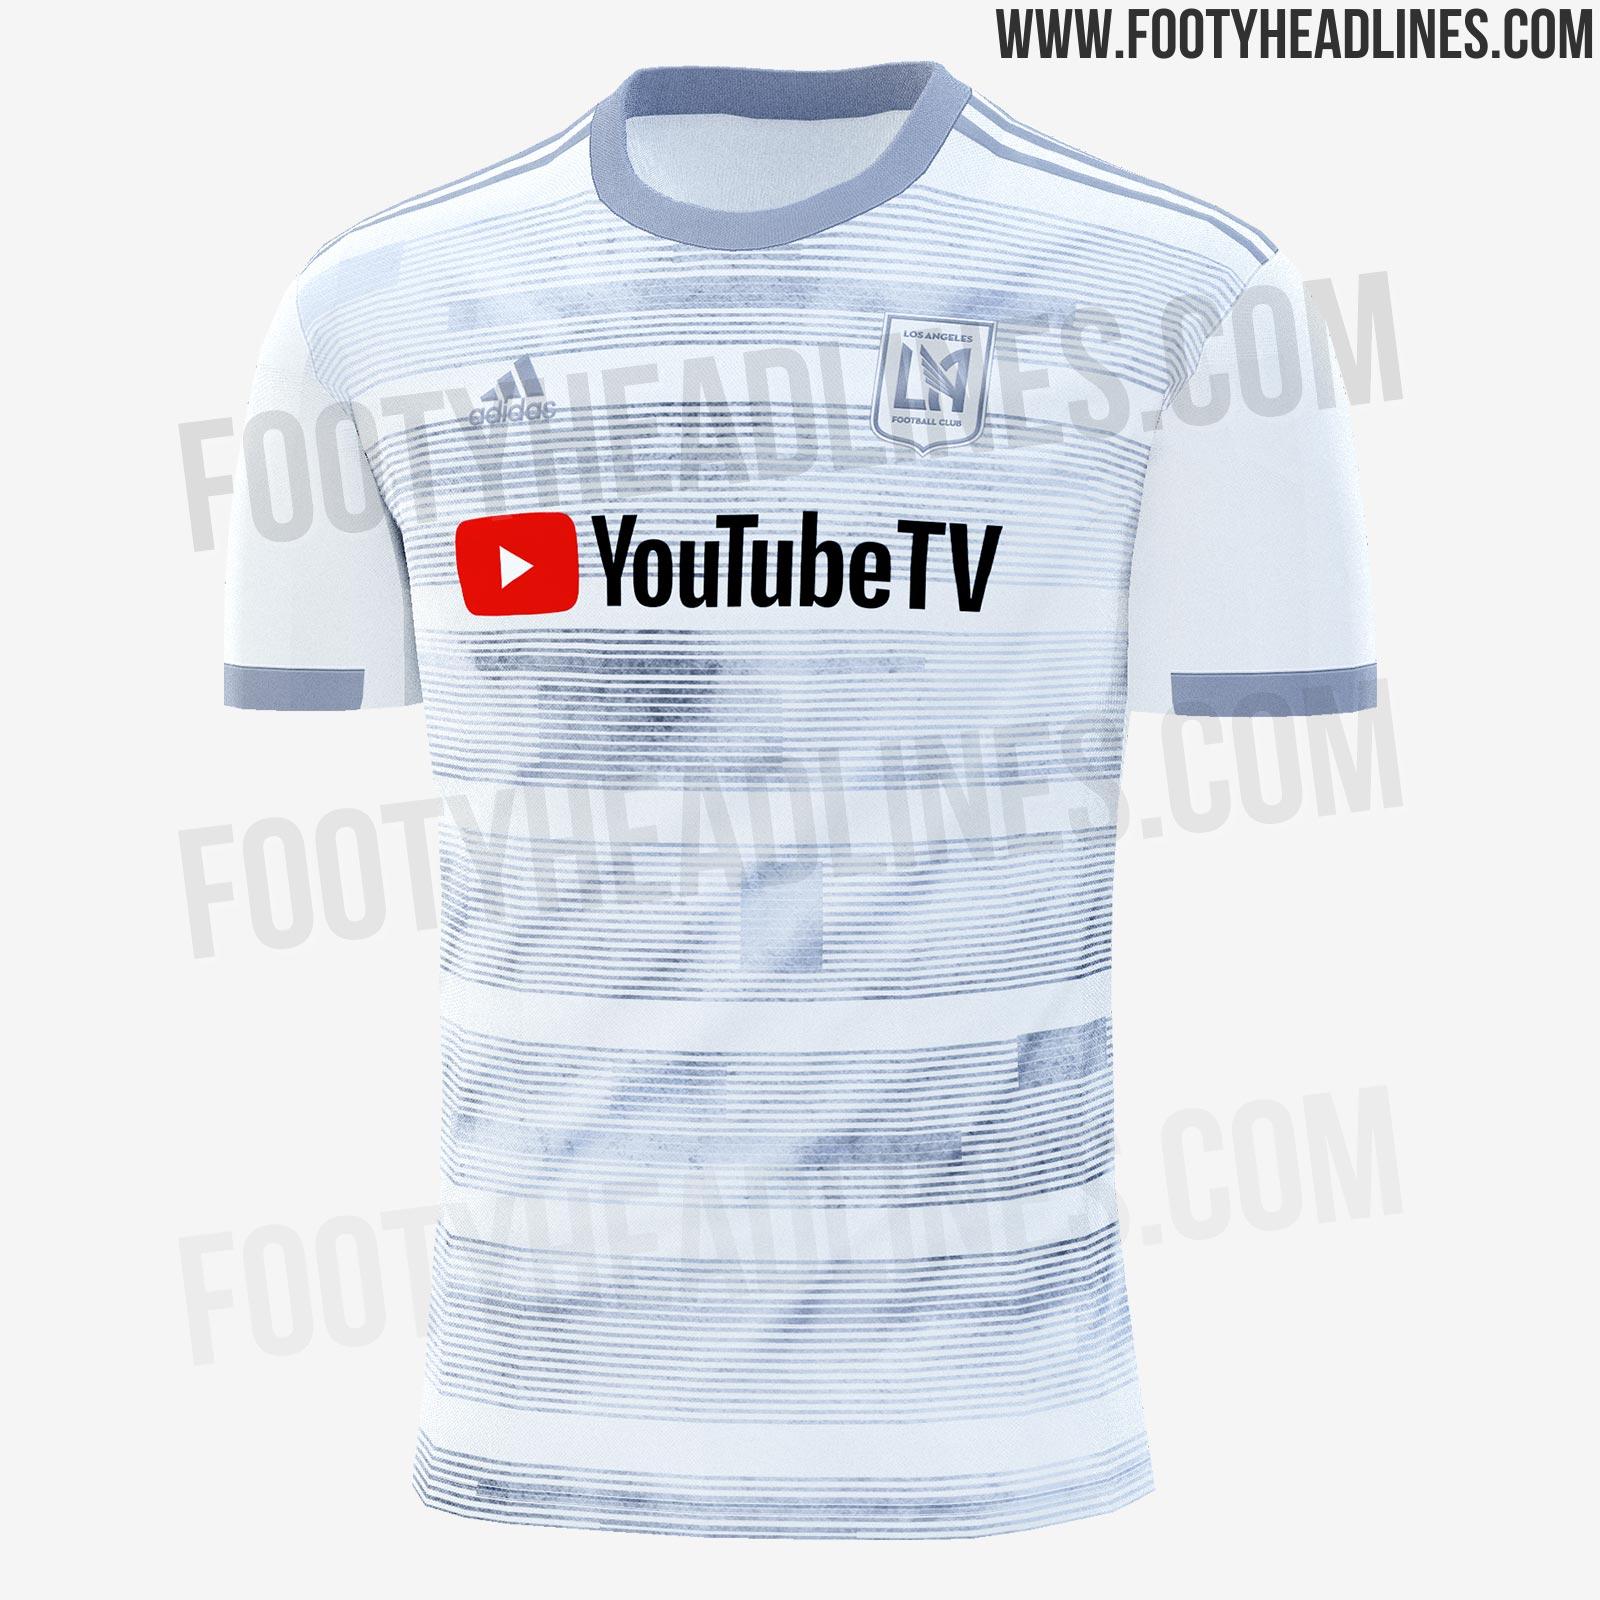 lafc-2019-away-kit-2.jpg